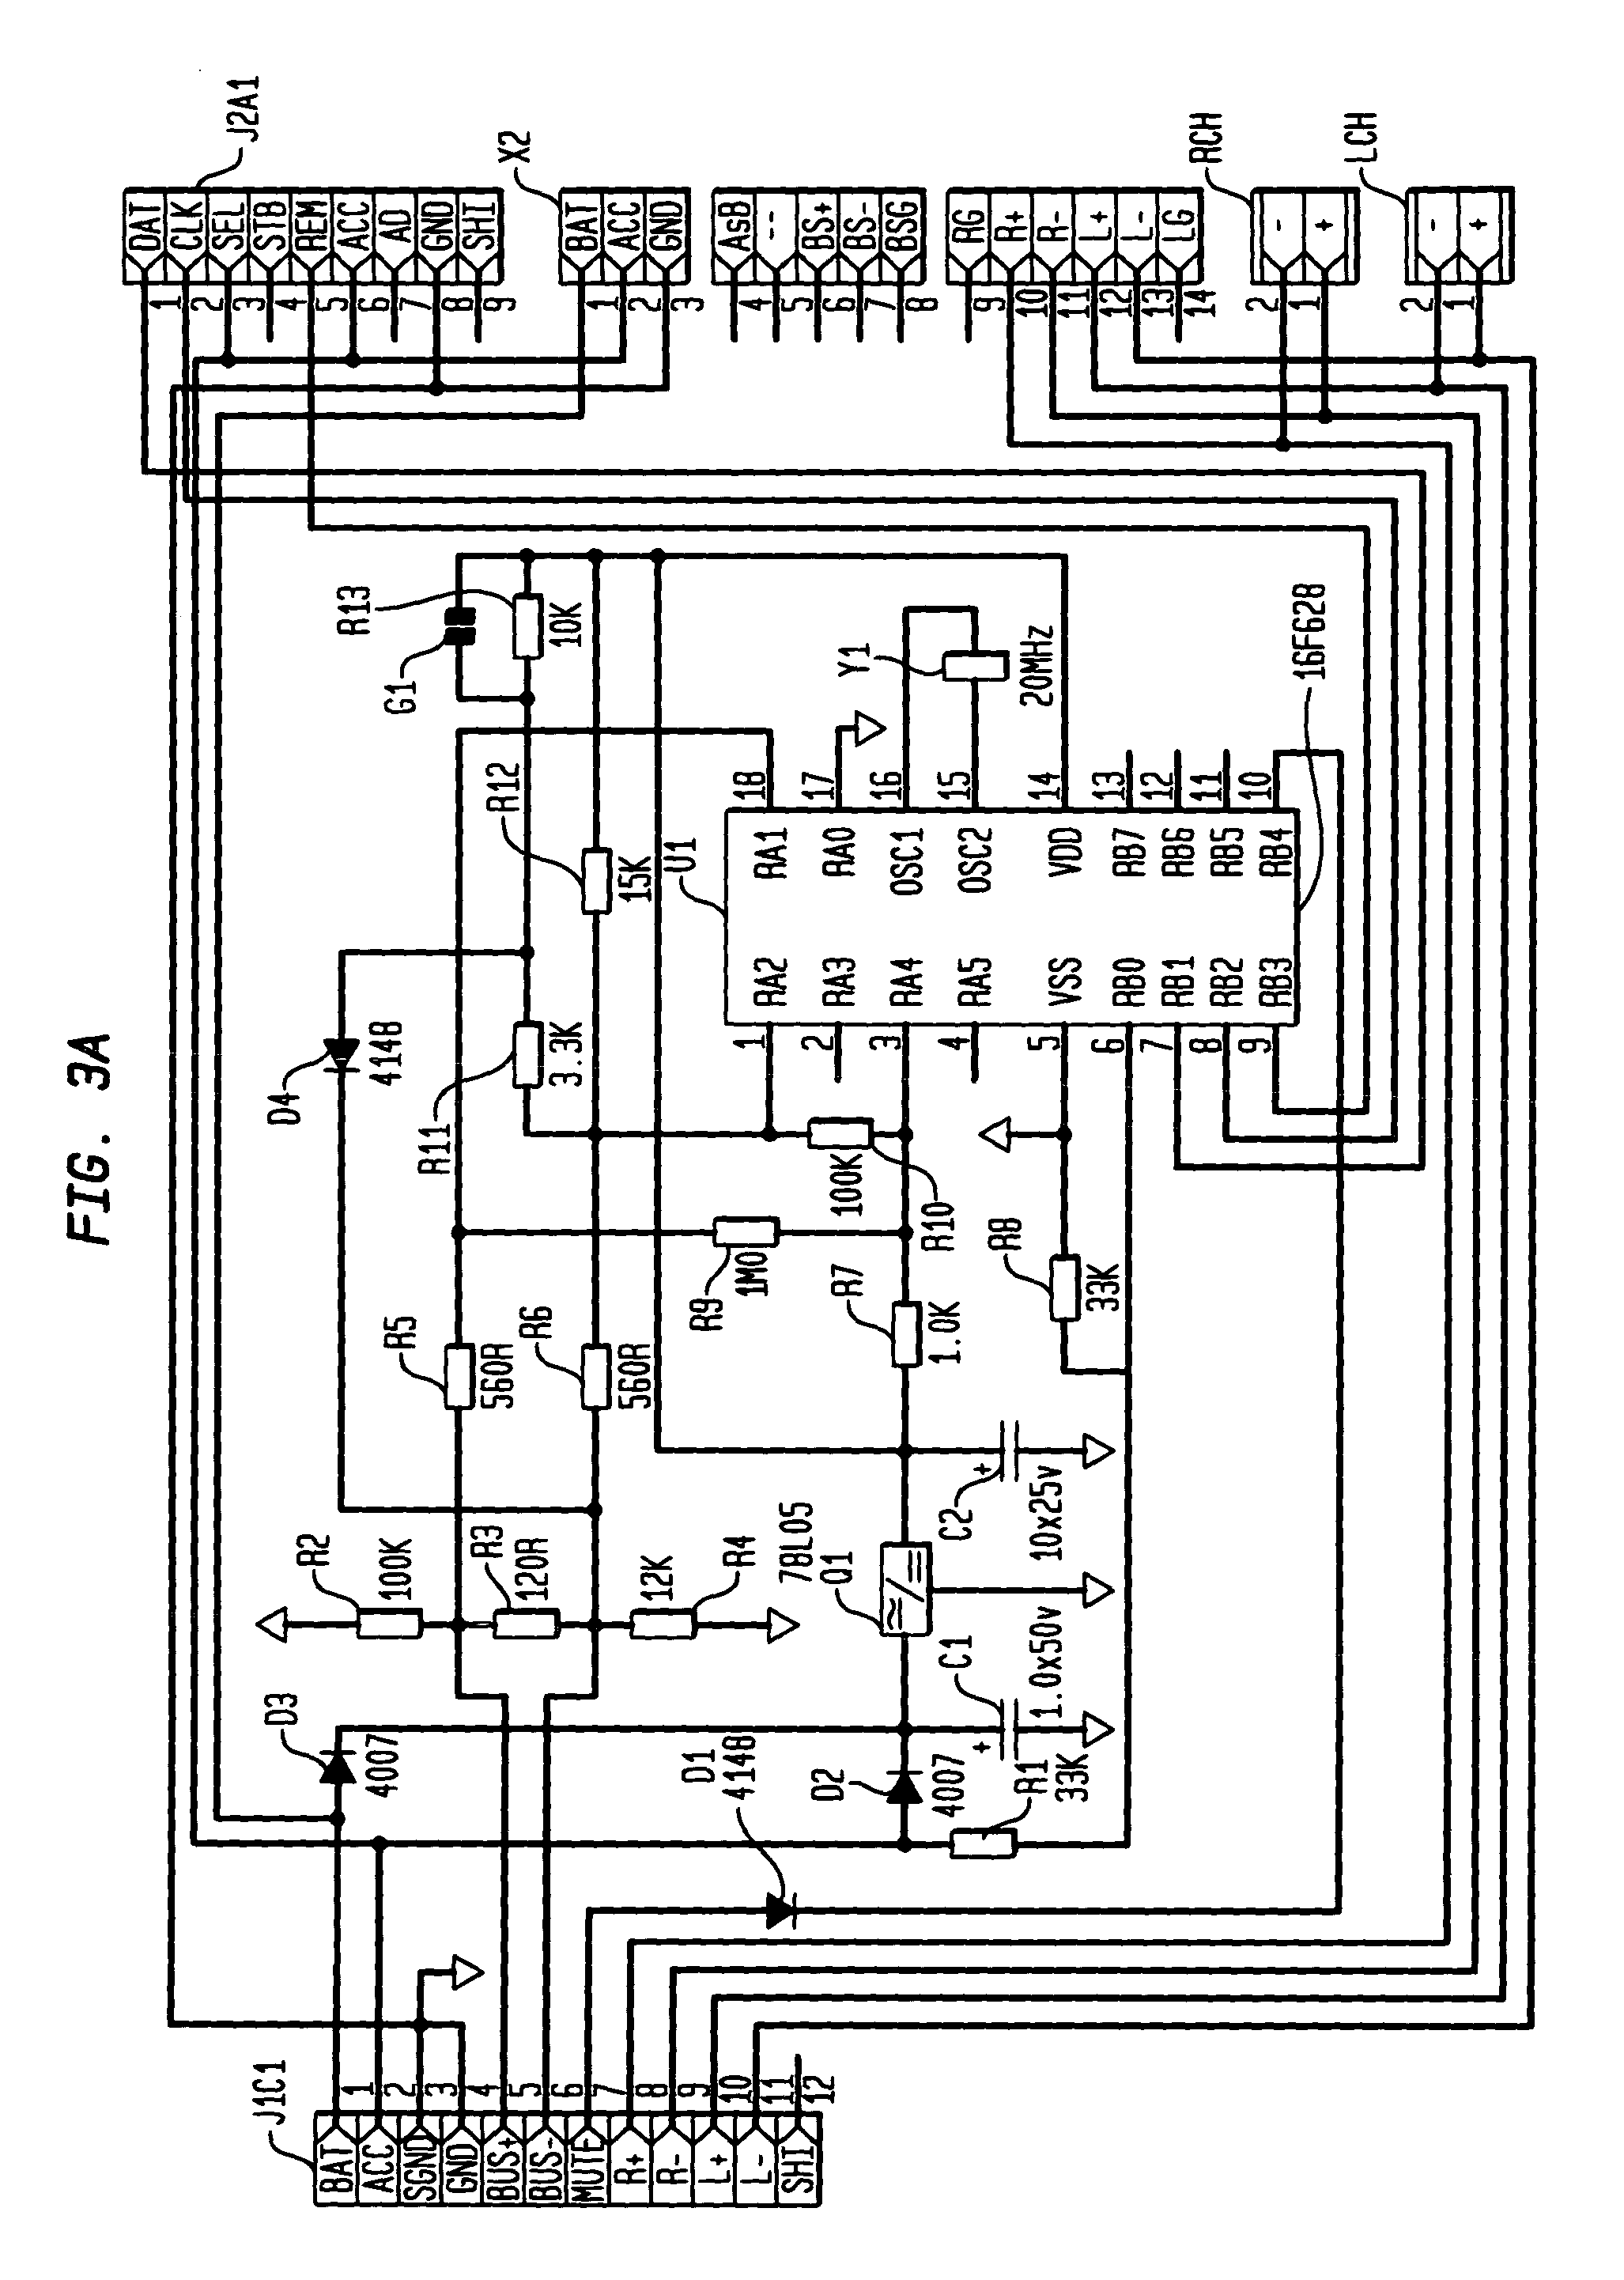 sanyo automedia wiring diagram sirius automedia  u2022 gsmportal co